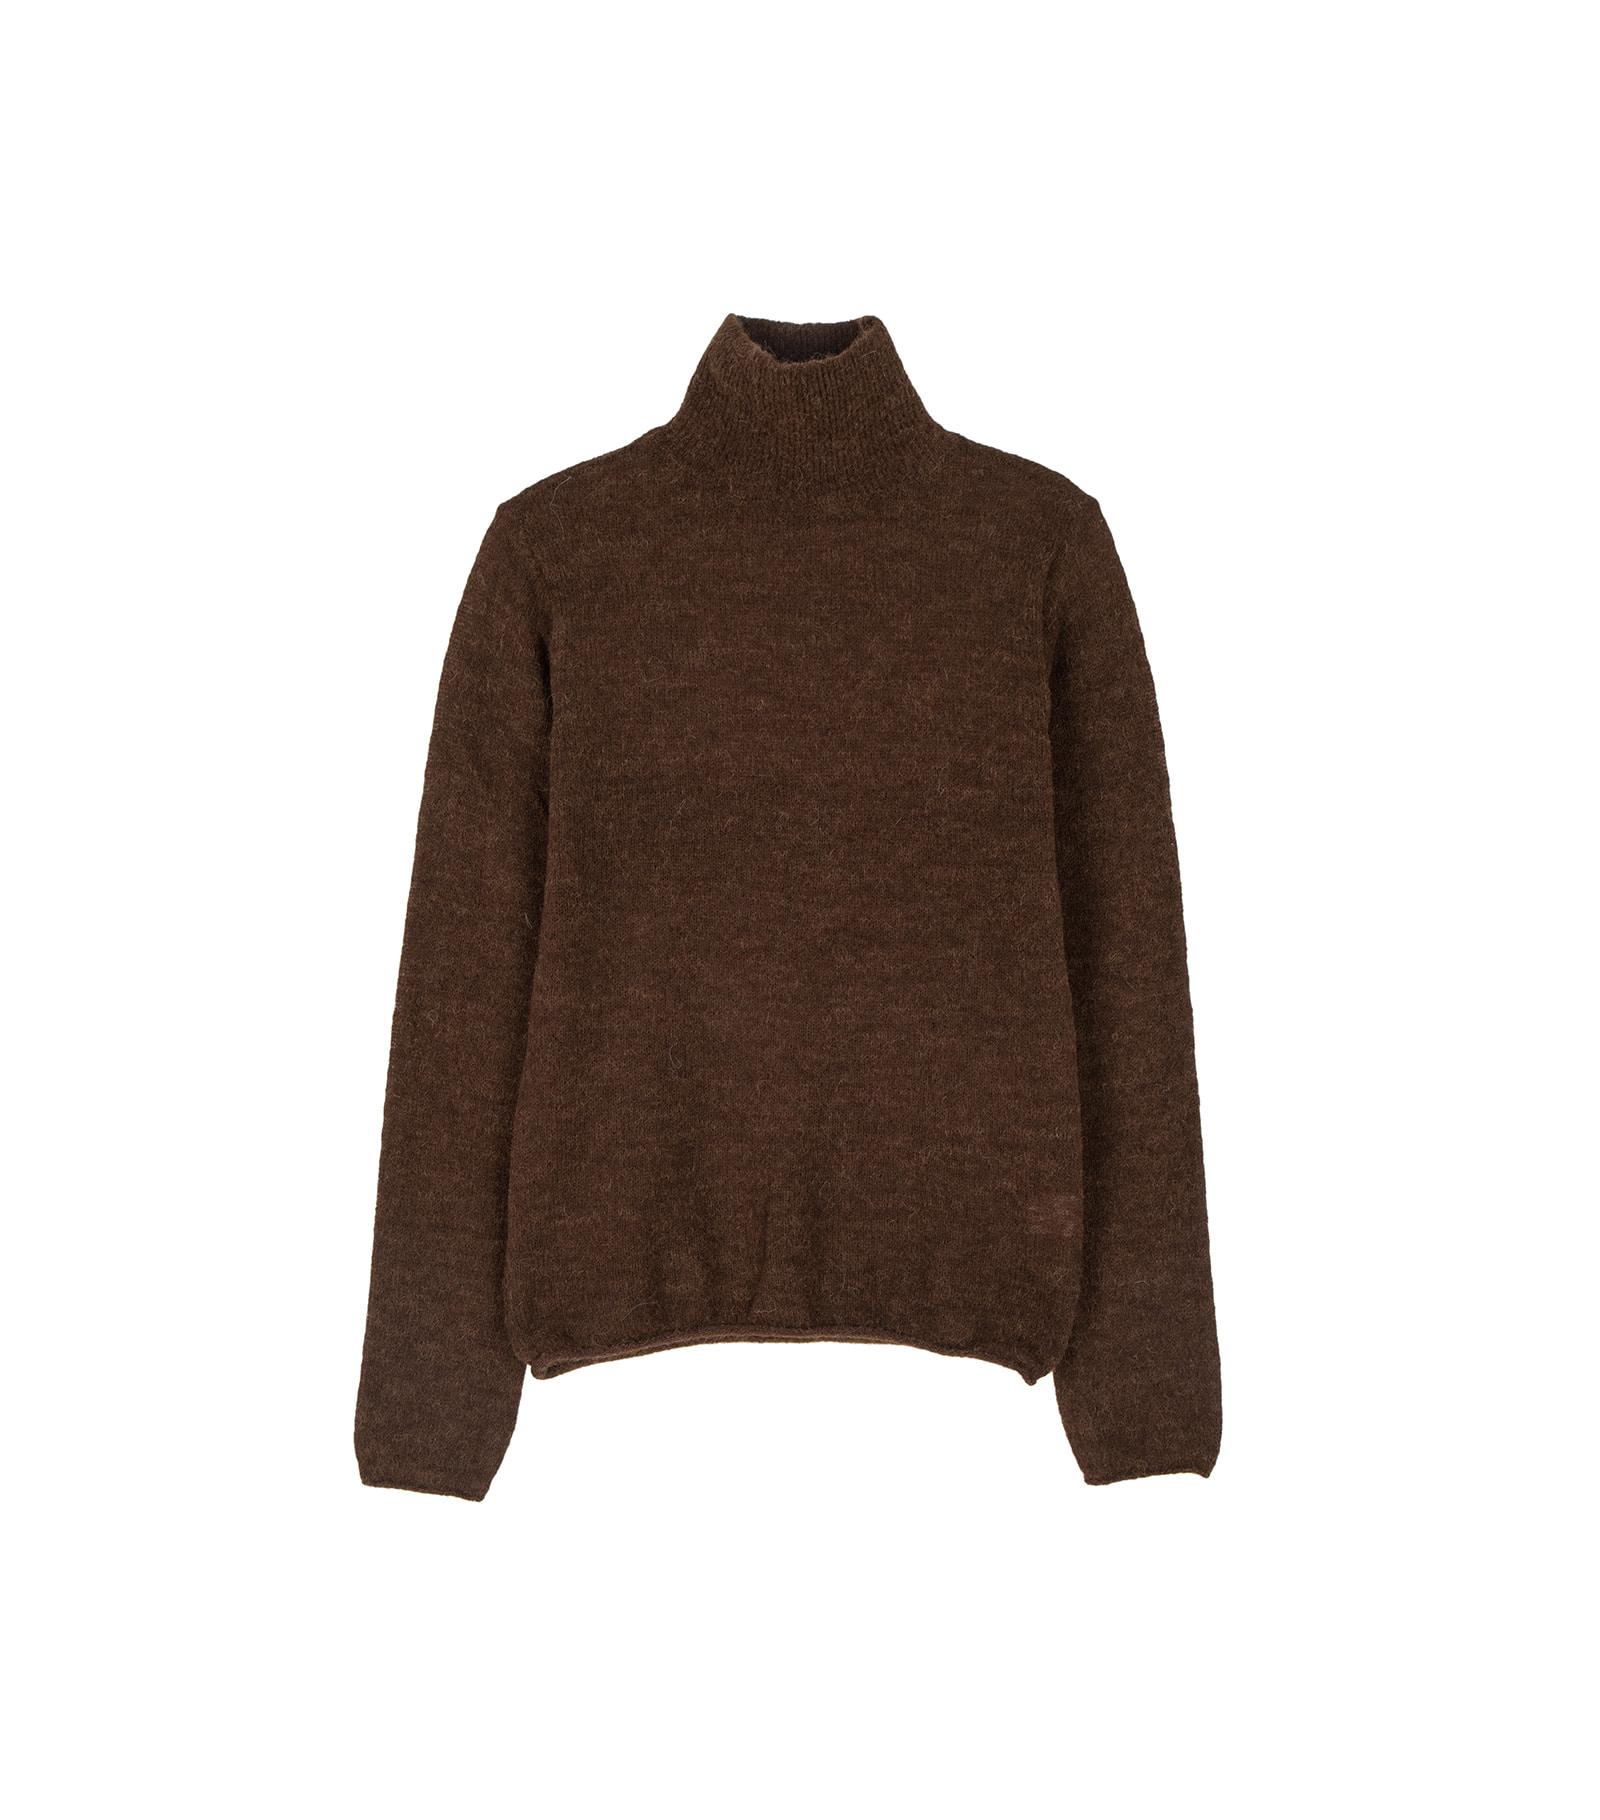 Bobo alpaca turtleneck knit